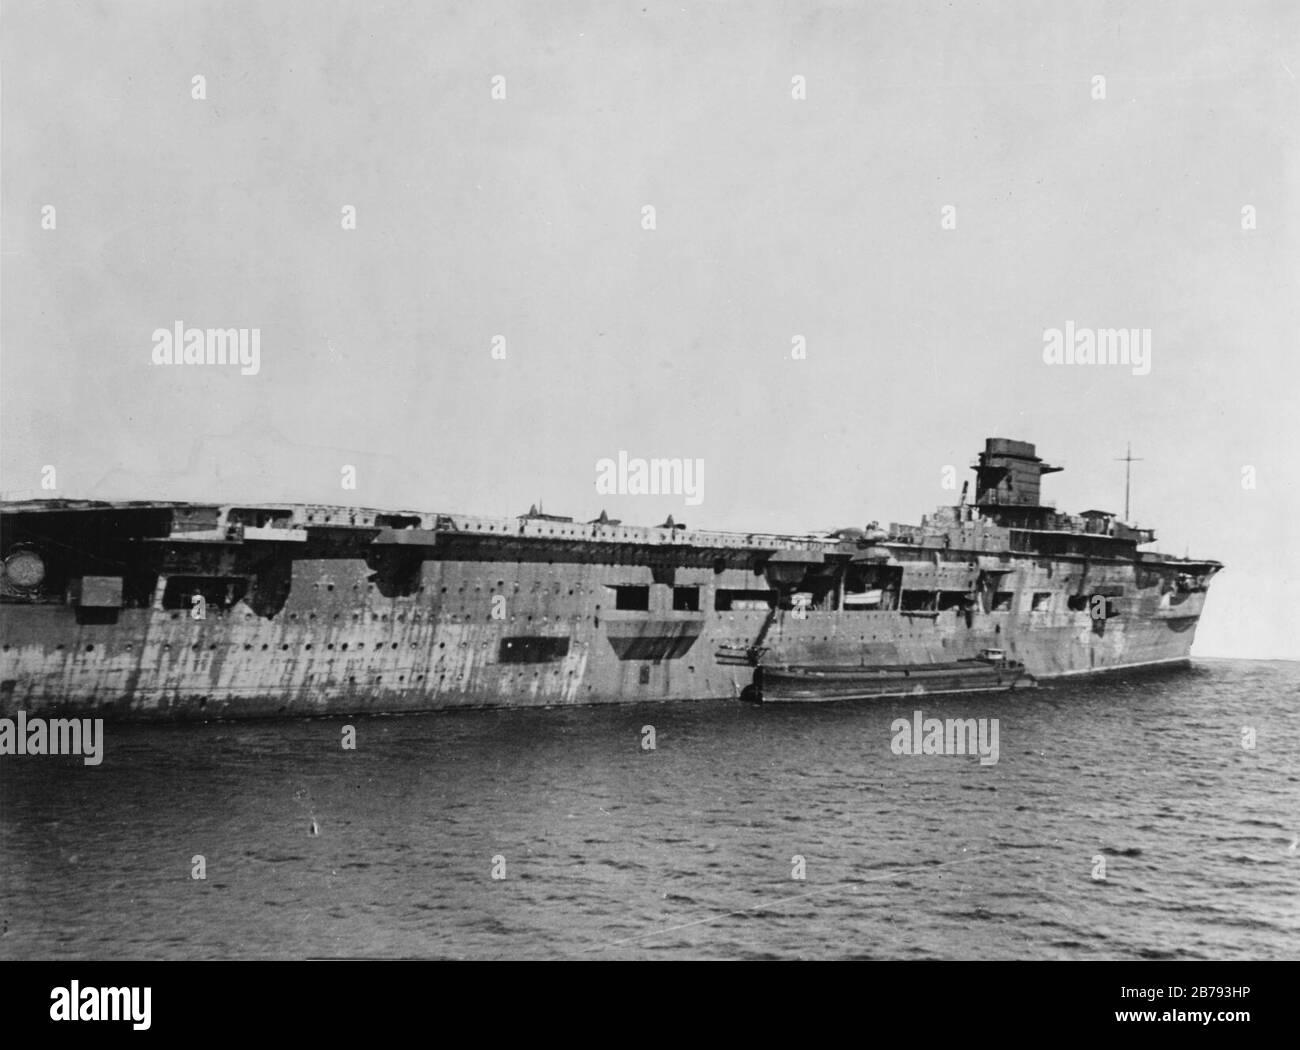 German aircraft carrier Graf Zeppelin at Swinemünde on 5 April 1947. Stock Photo